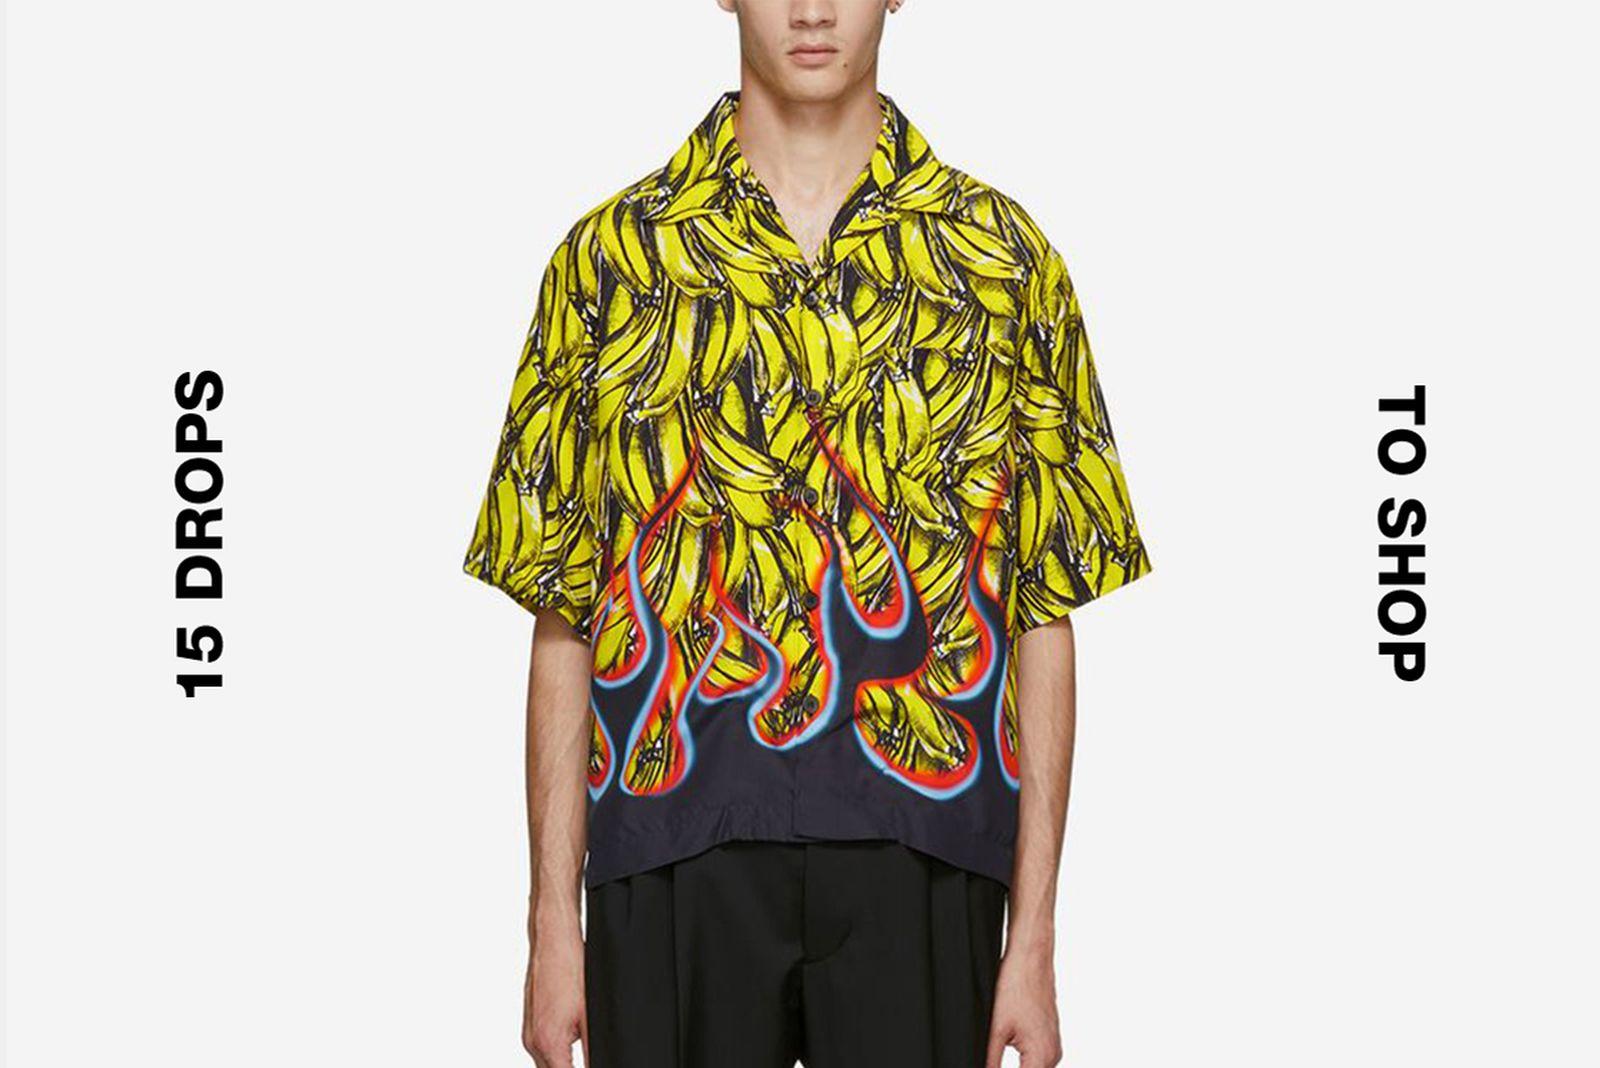 nike react element 87 buy online BAPE 1st Camo BAPE STA Common Cloth Drop Dead